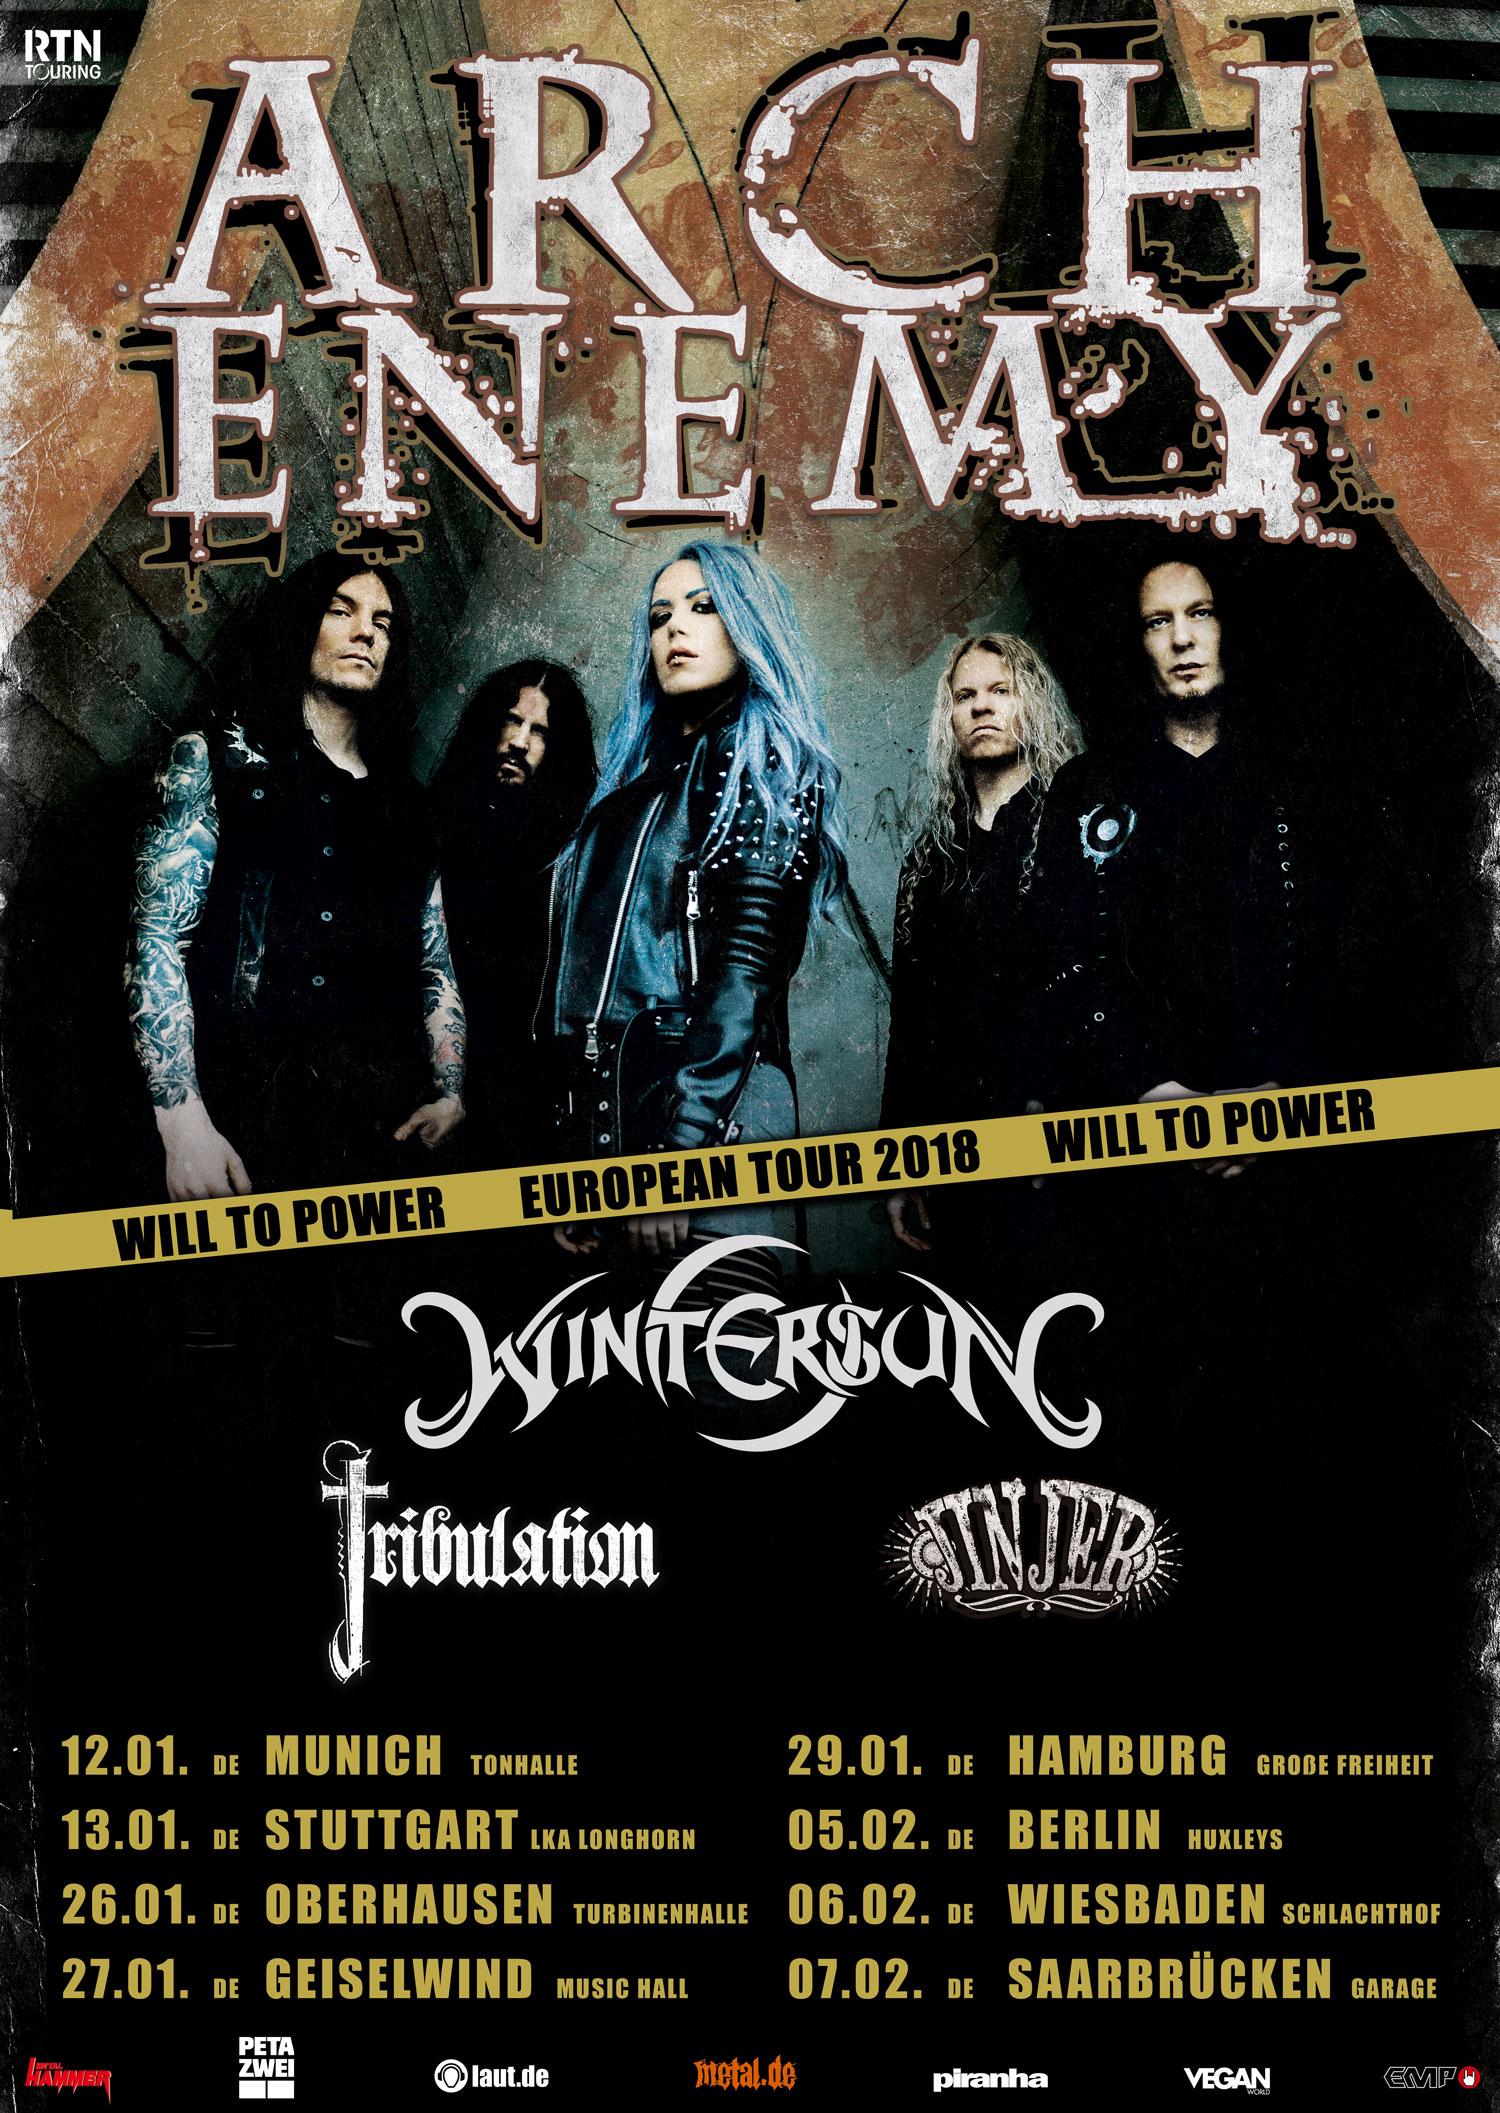 Bild Arch Enemy Tour Poster 2018